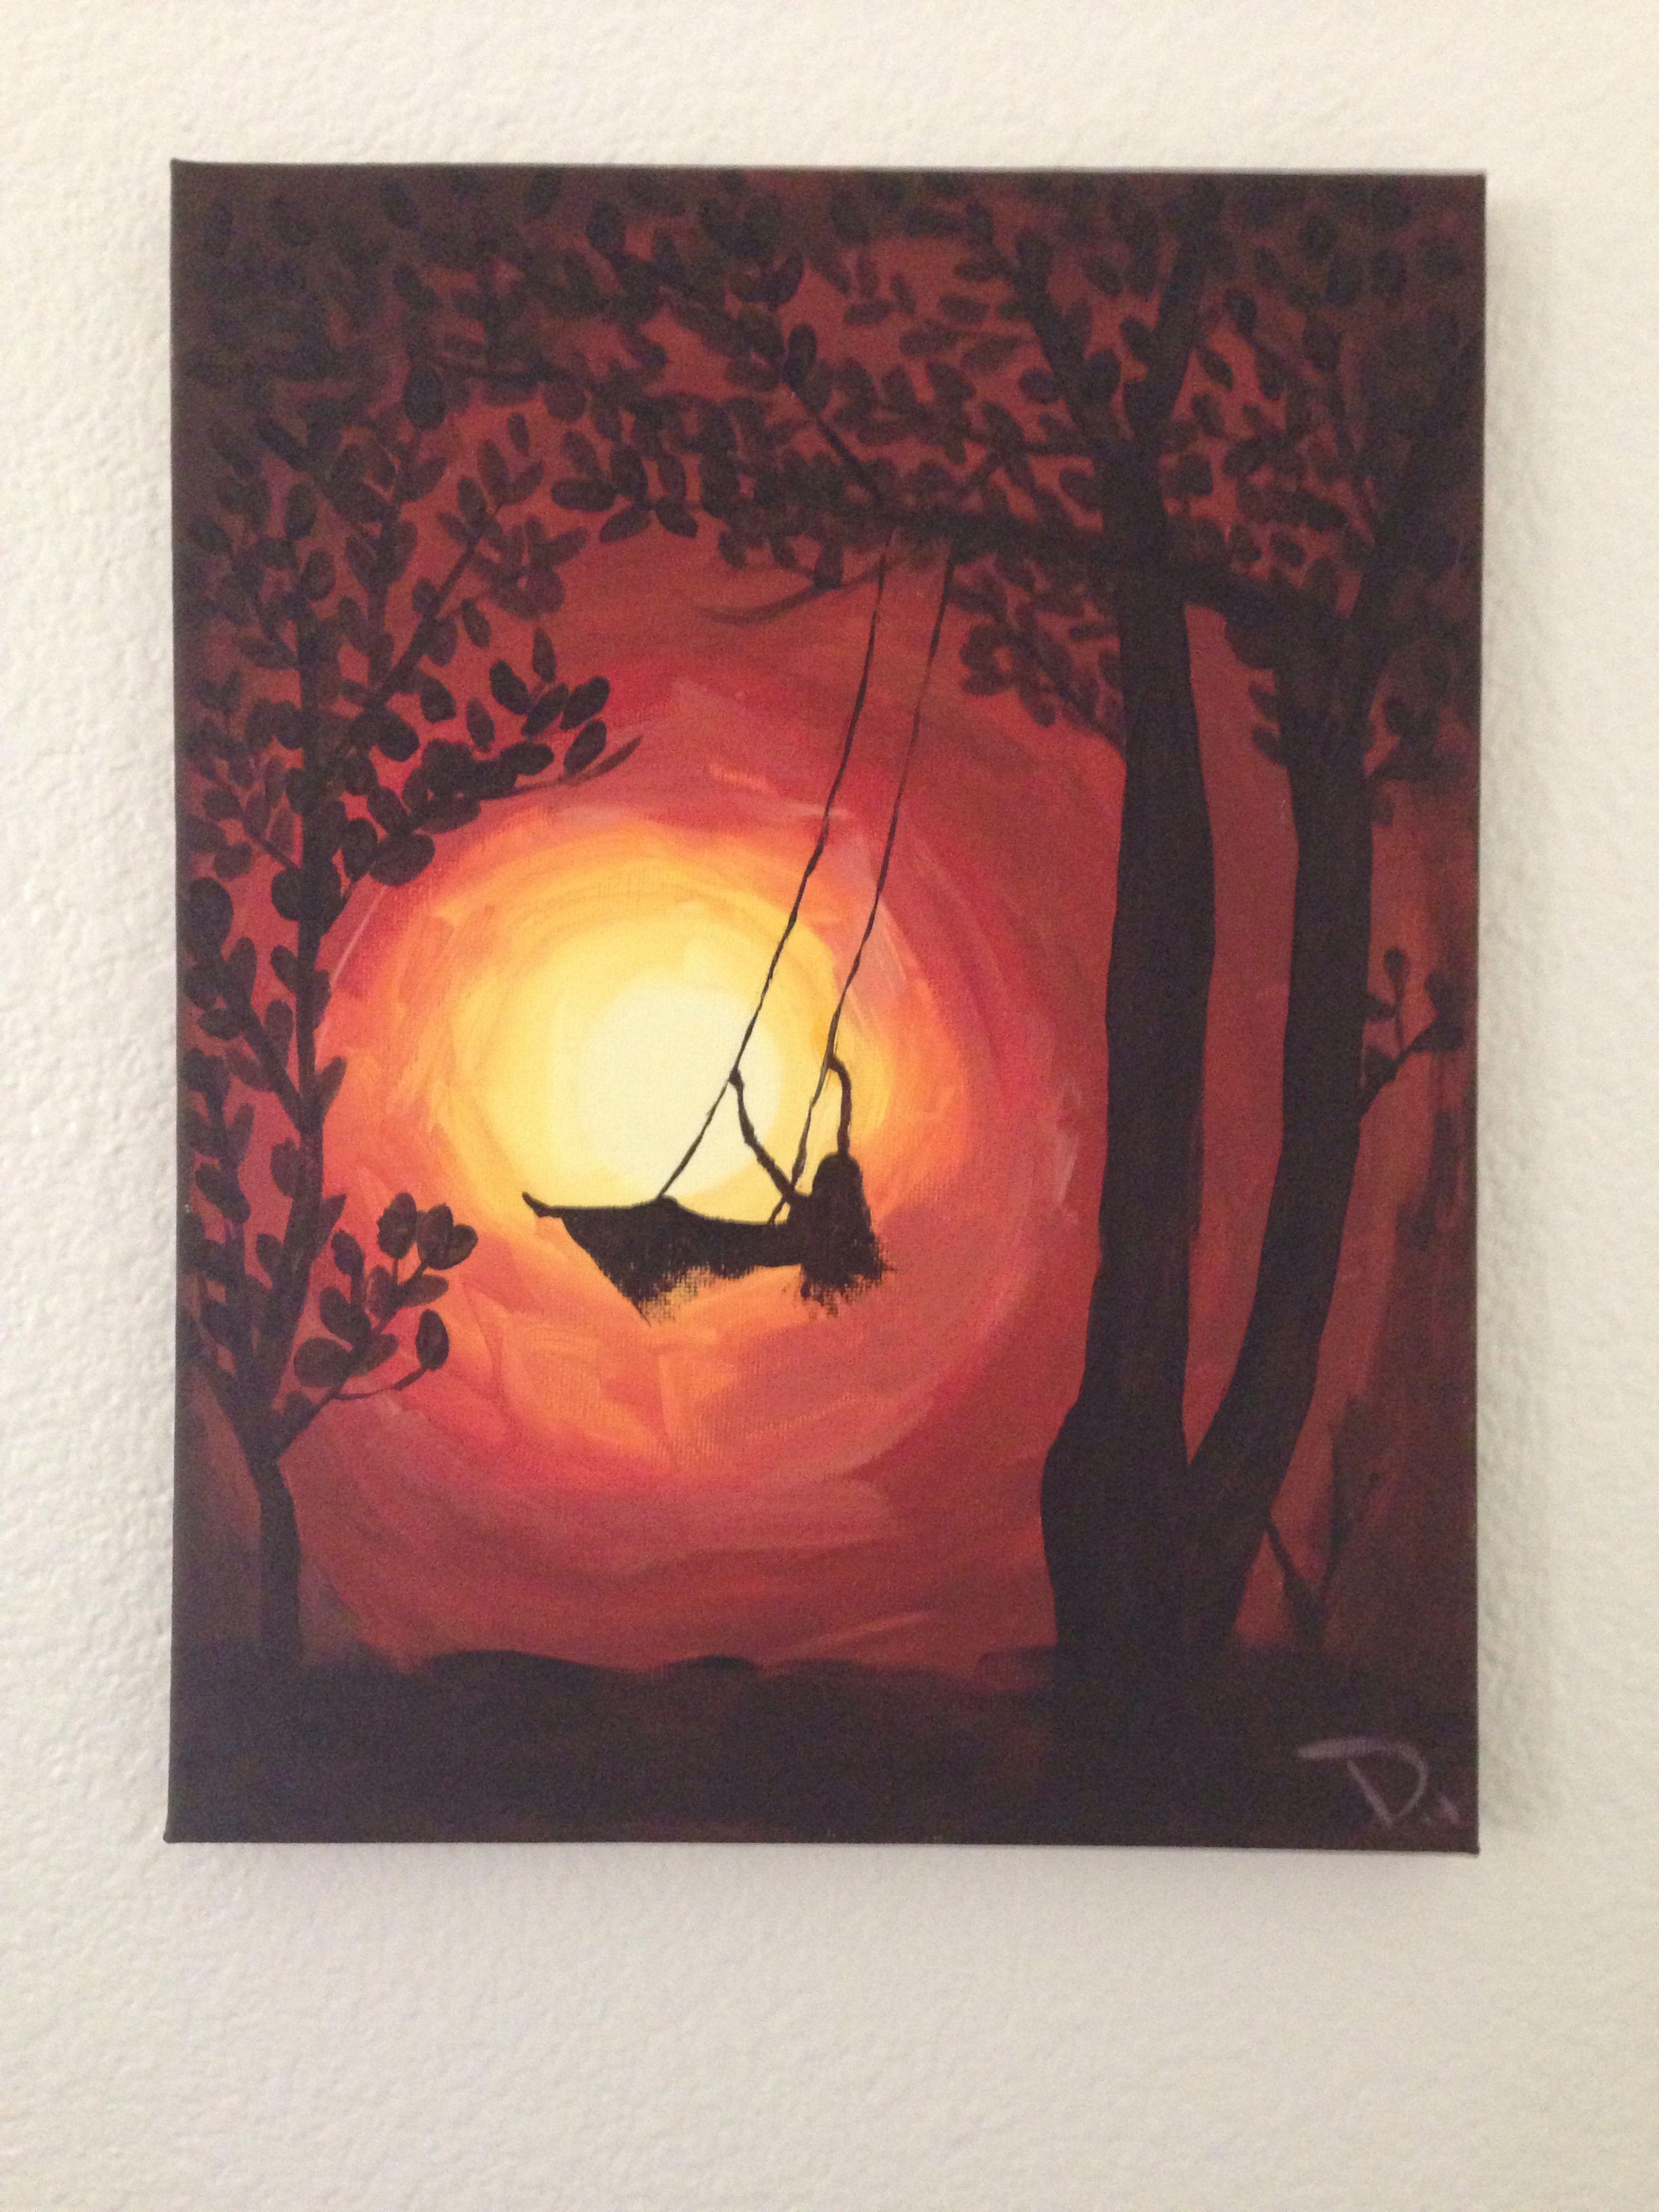 """carol"" Tree Painting With Silhouette Of Woman Swinging"